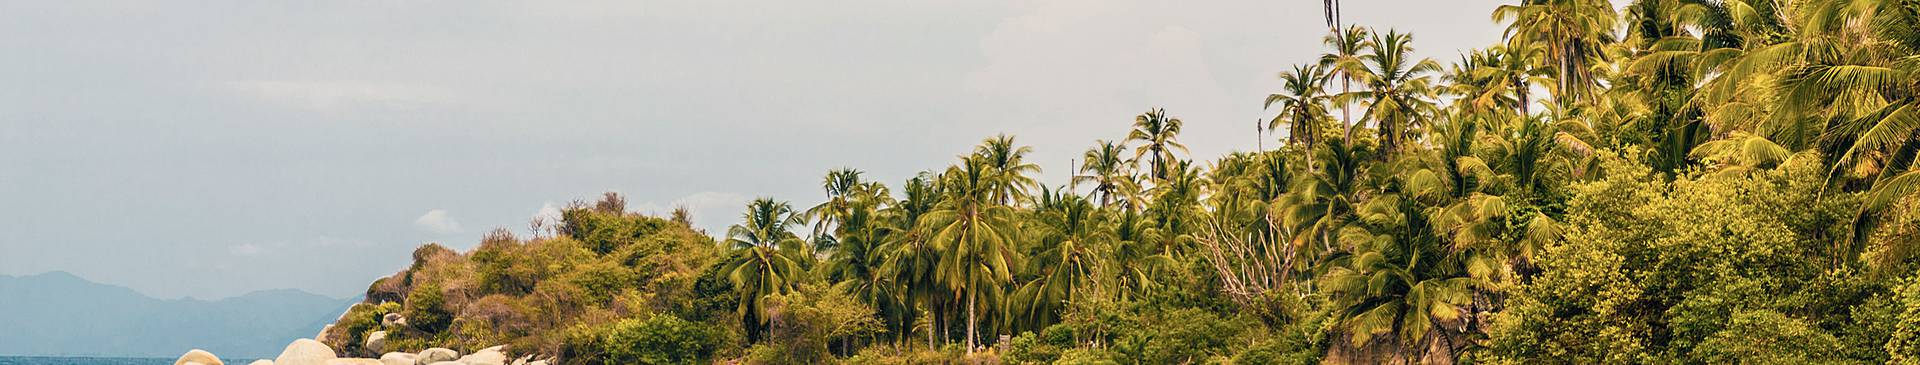 Voyage plage en Colombie